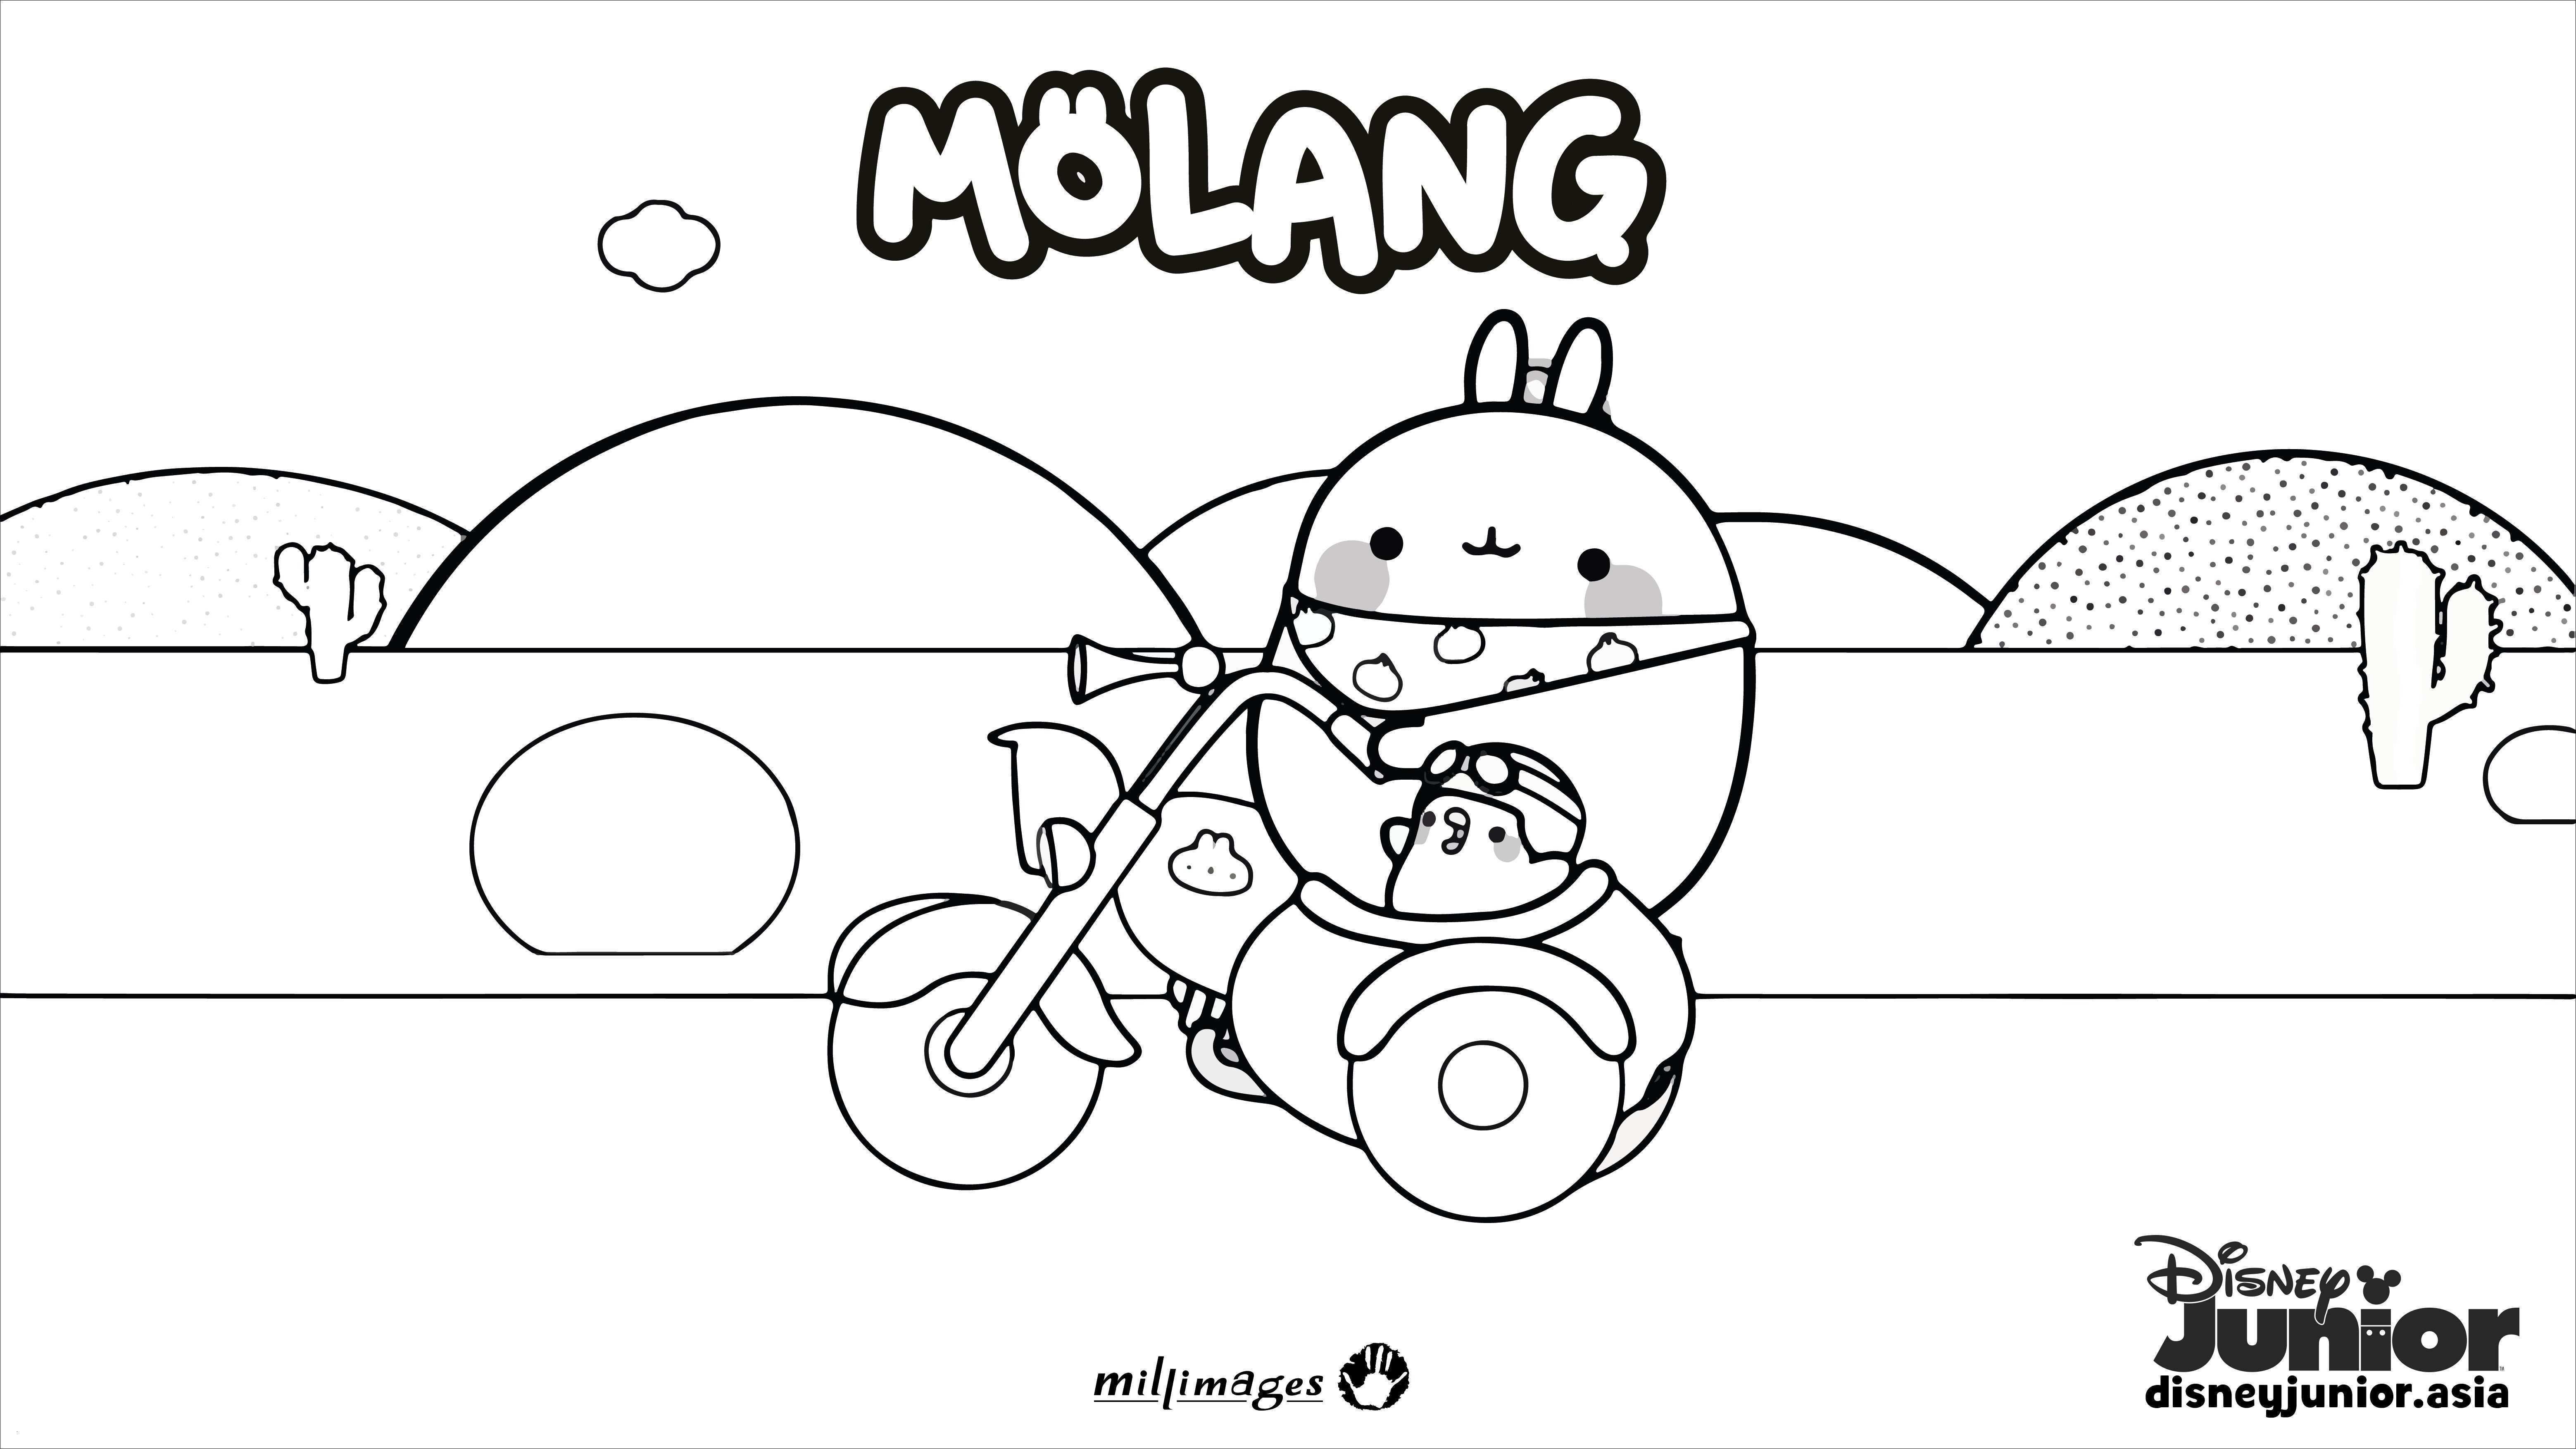 Micky Maus Bilder Zum Ausmalen Neu Mickey Mouse Zum Ausmalen Vorstellung 37 Ausmalbilder Baby Micky Stock